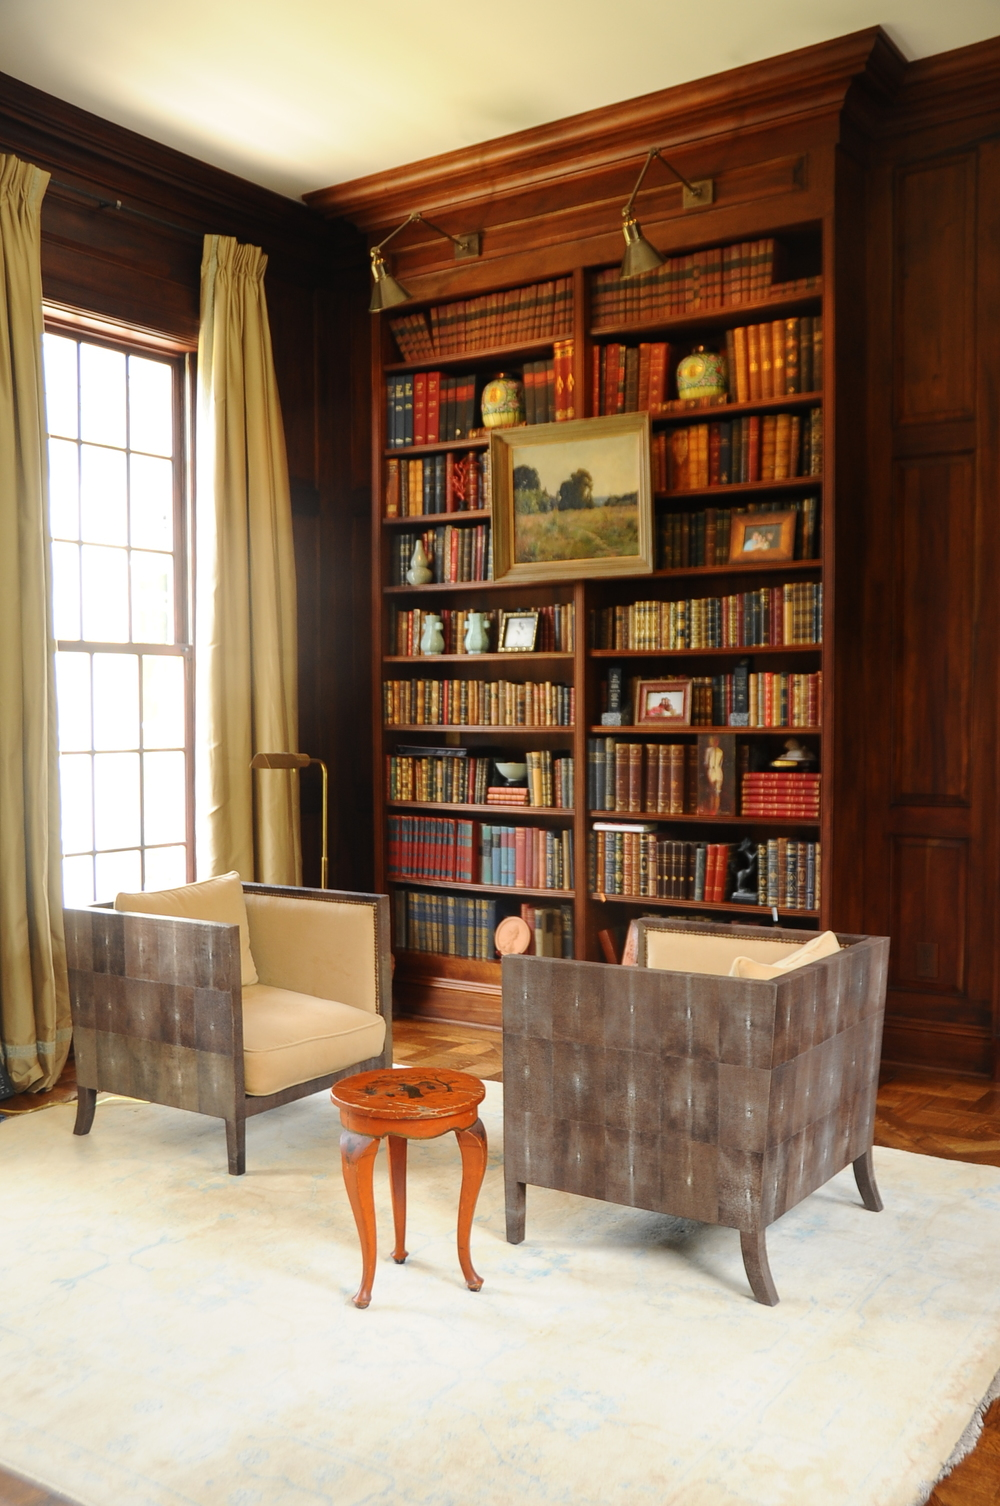 mckay_library.JPG